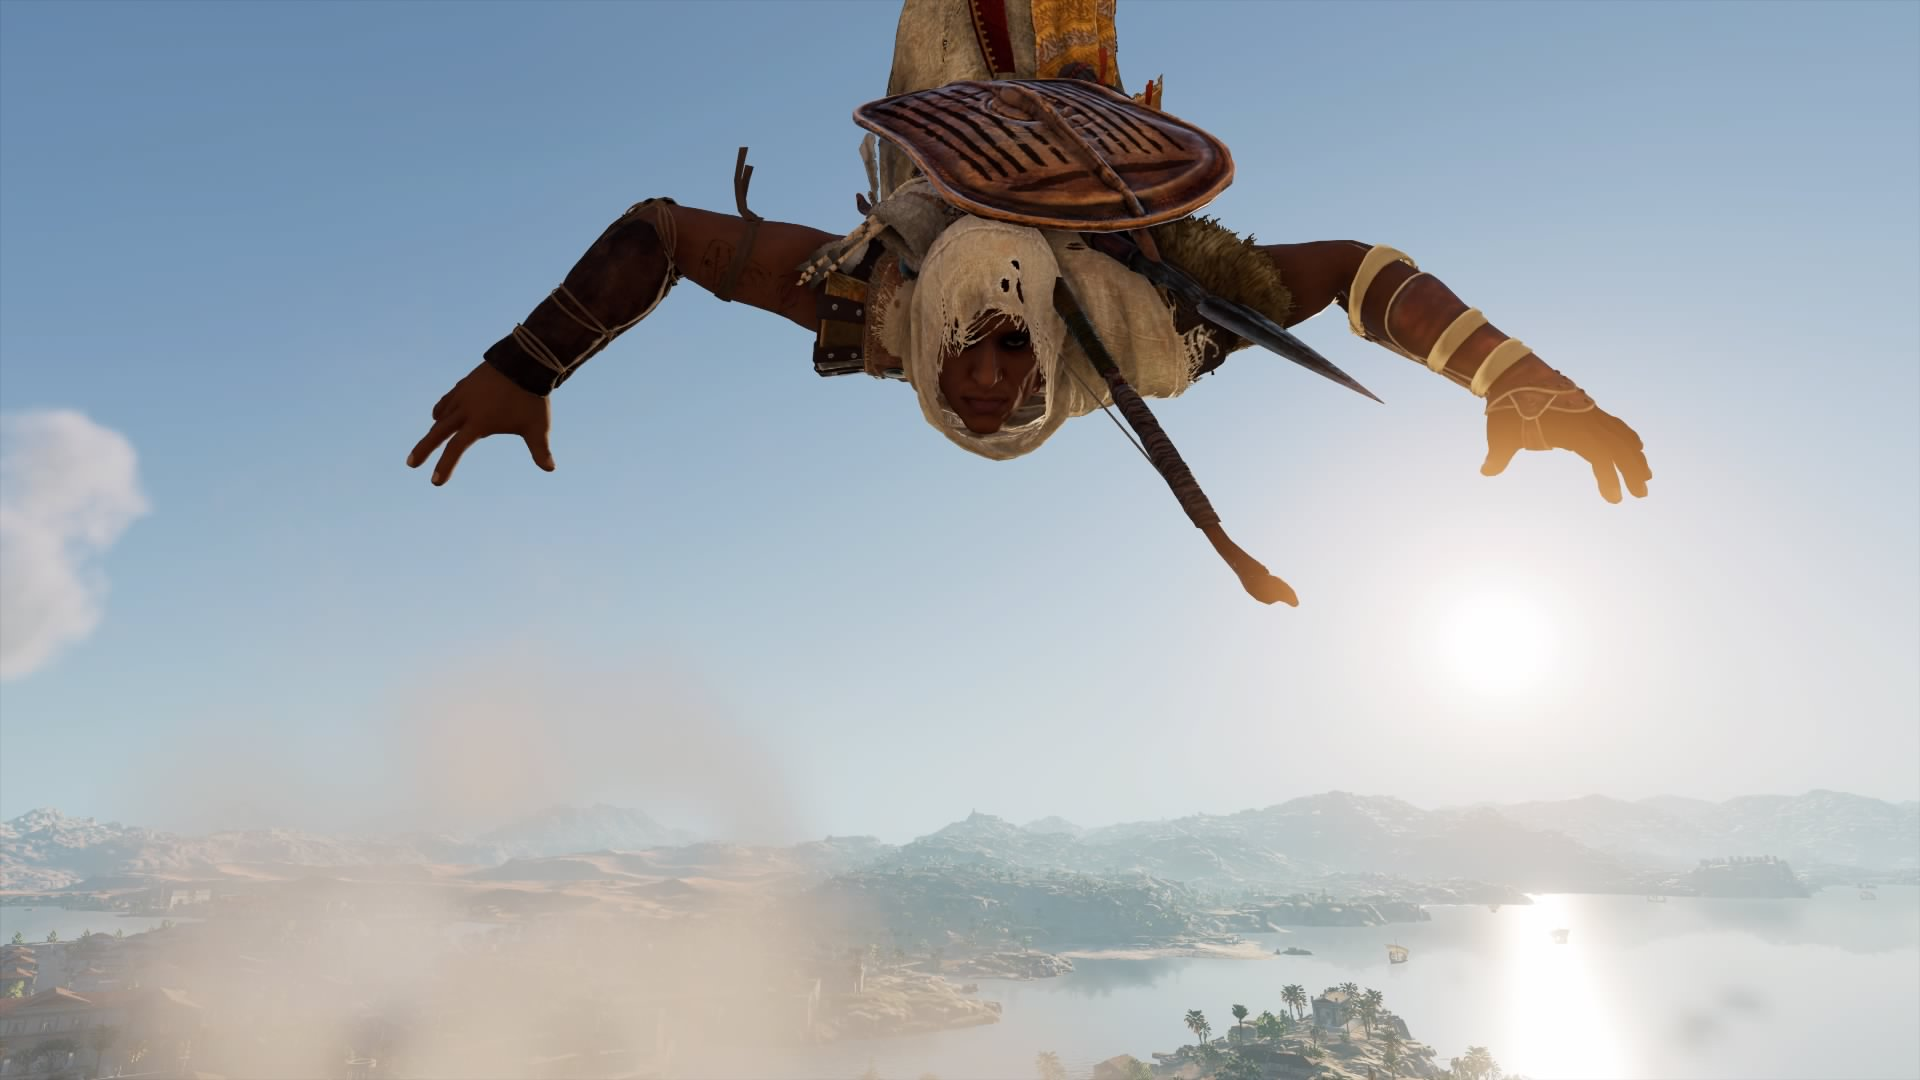 Assassin's Creed® Истоки__66.jpeg - Assassin's Creed: Origins